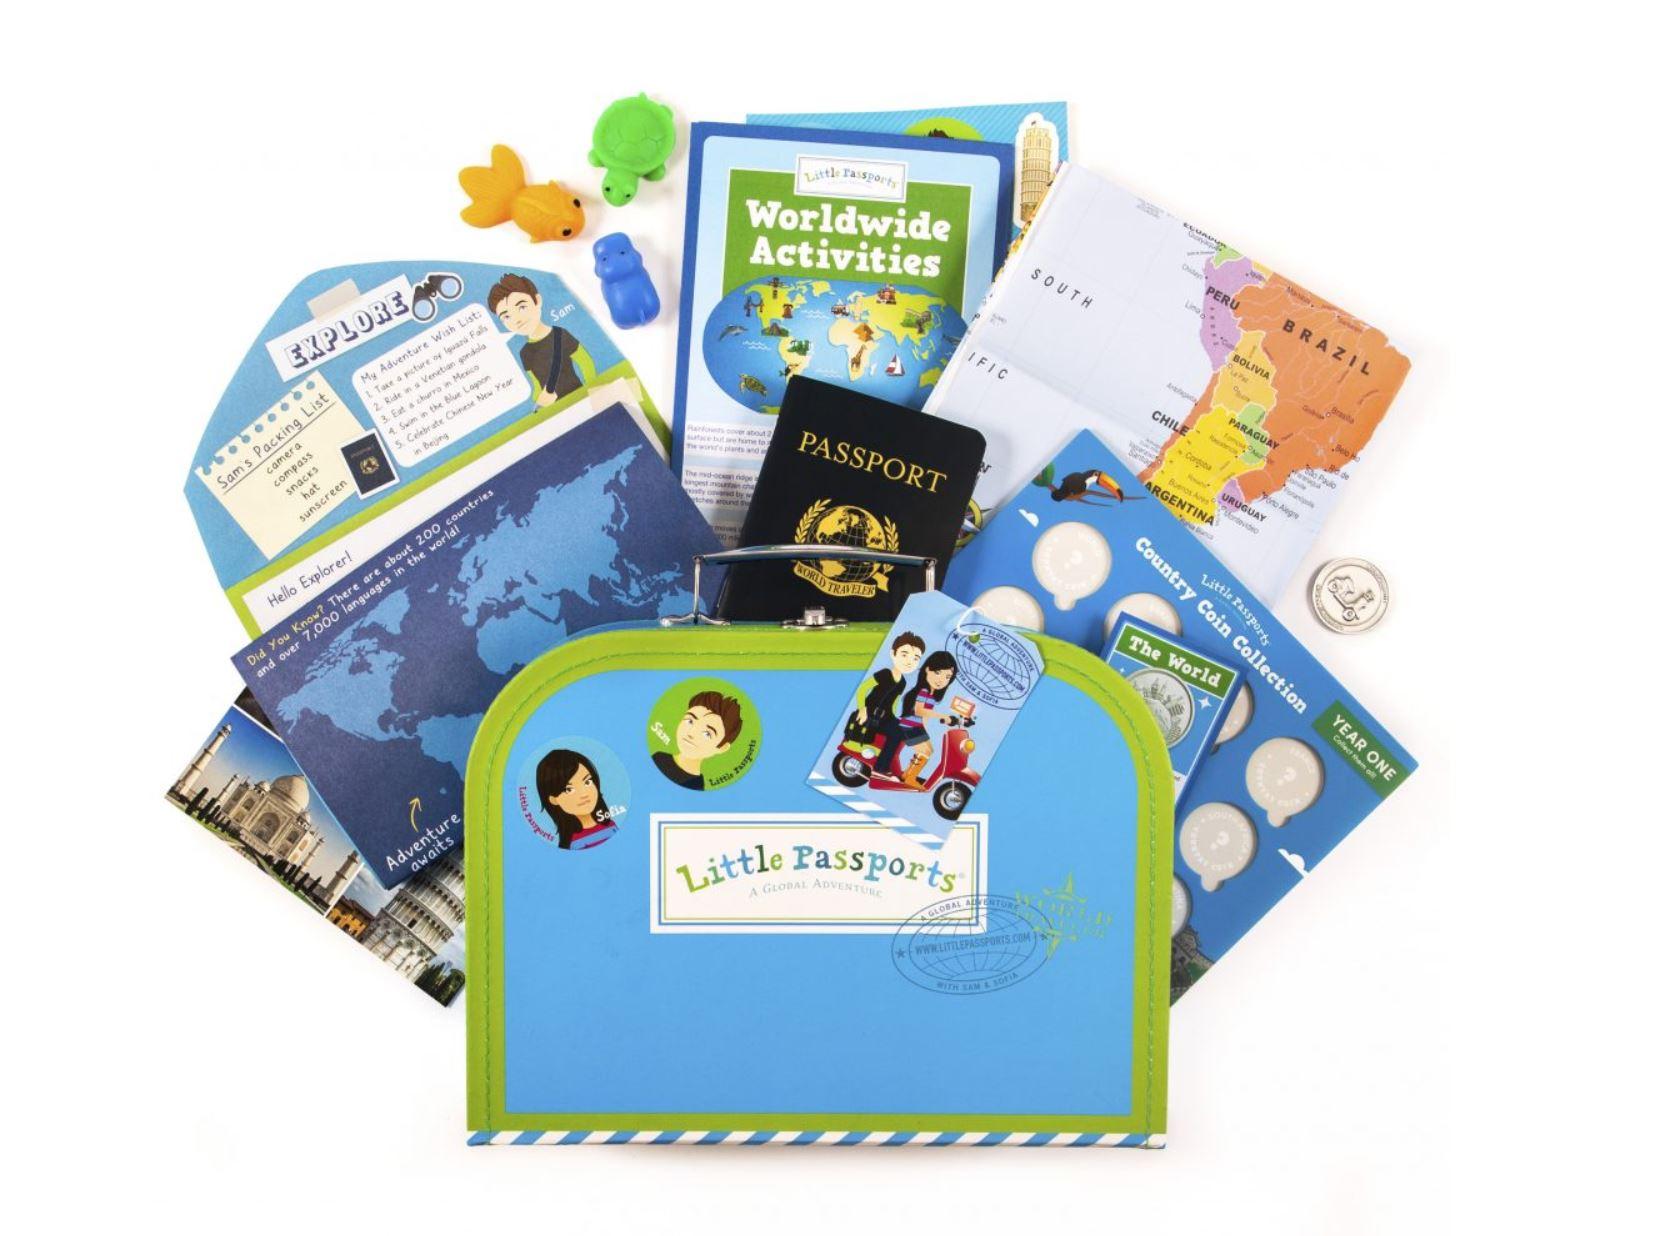 Little Passports Summer Camp Box 2020 Coupon